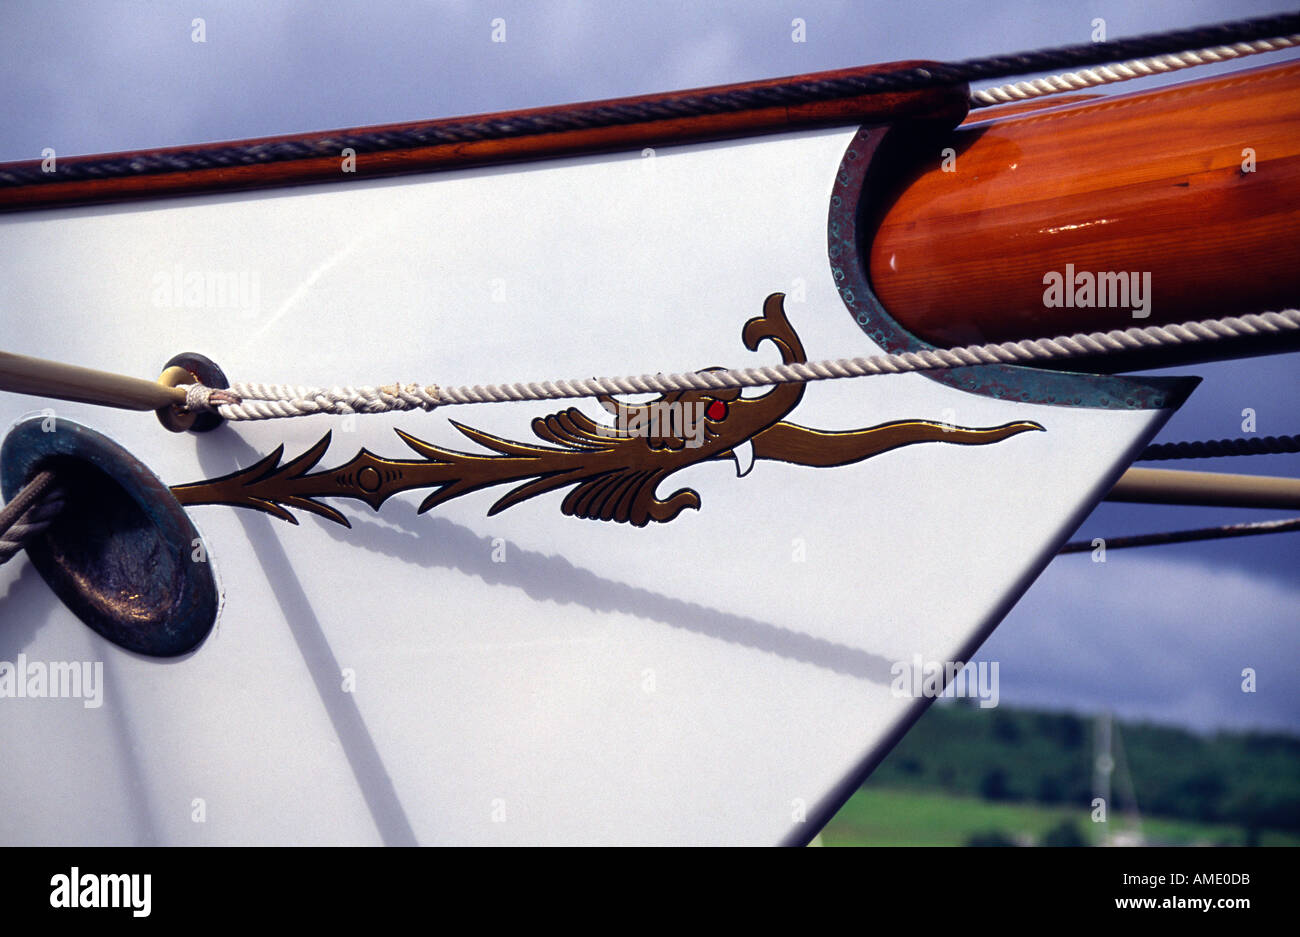 Dragon detail on bow of Fife designed classic yacht Belle Aventure rhu marina scotland Stock Photo